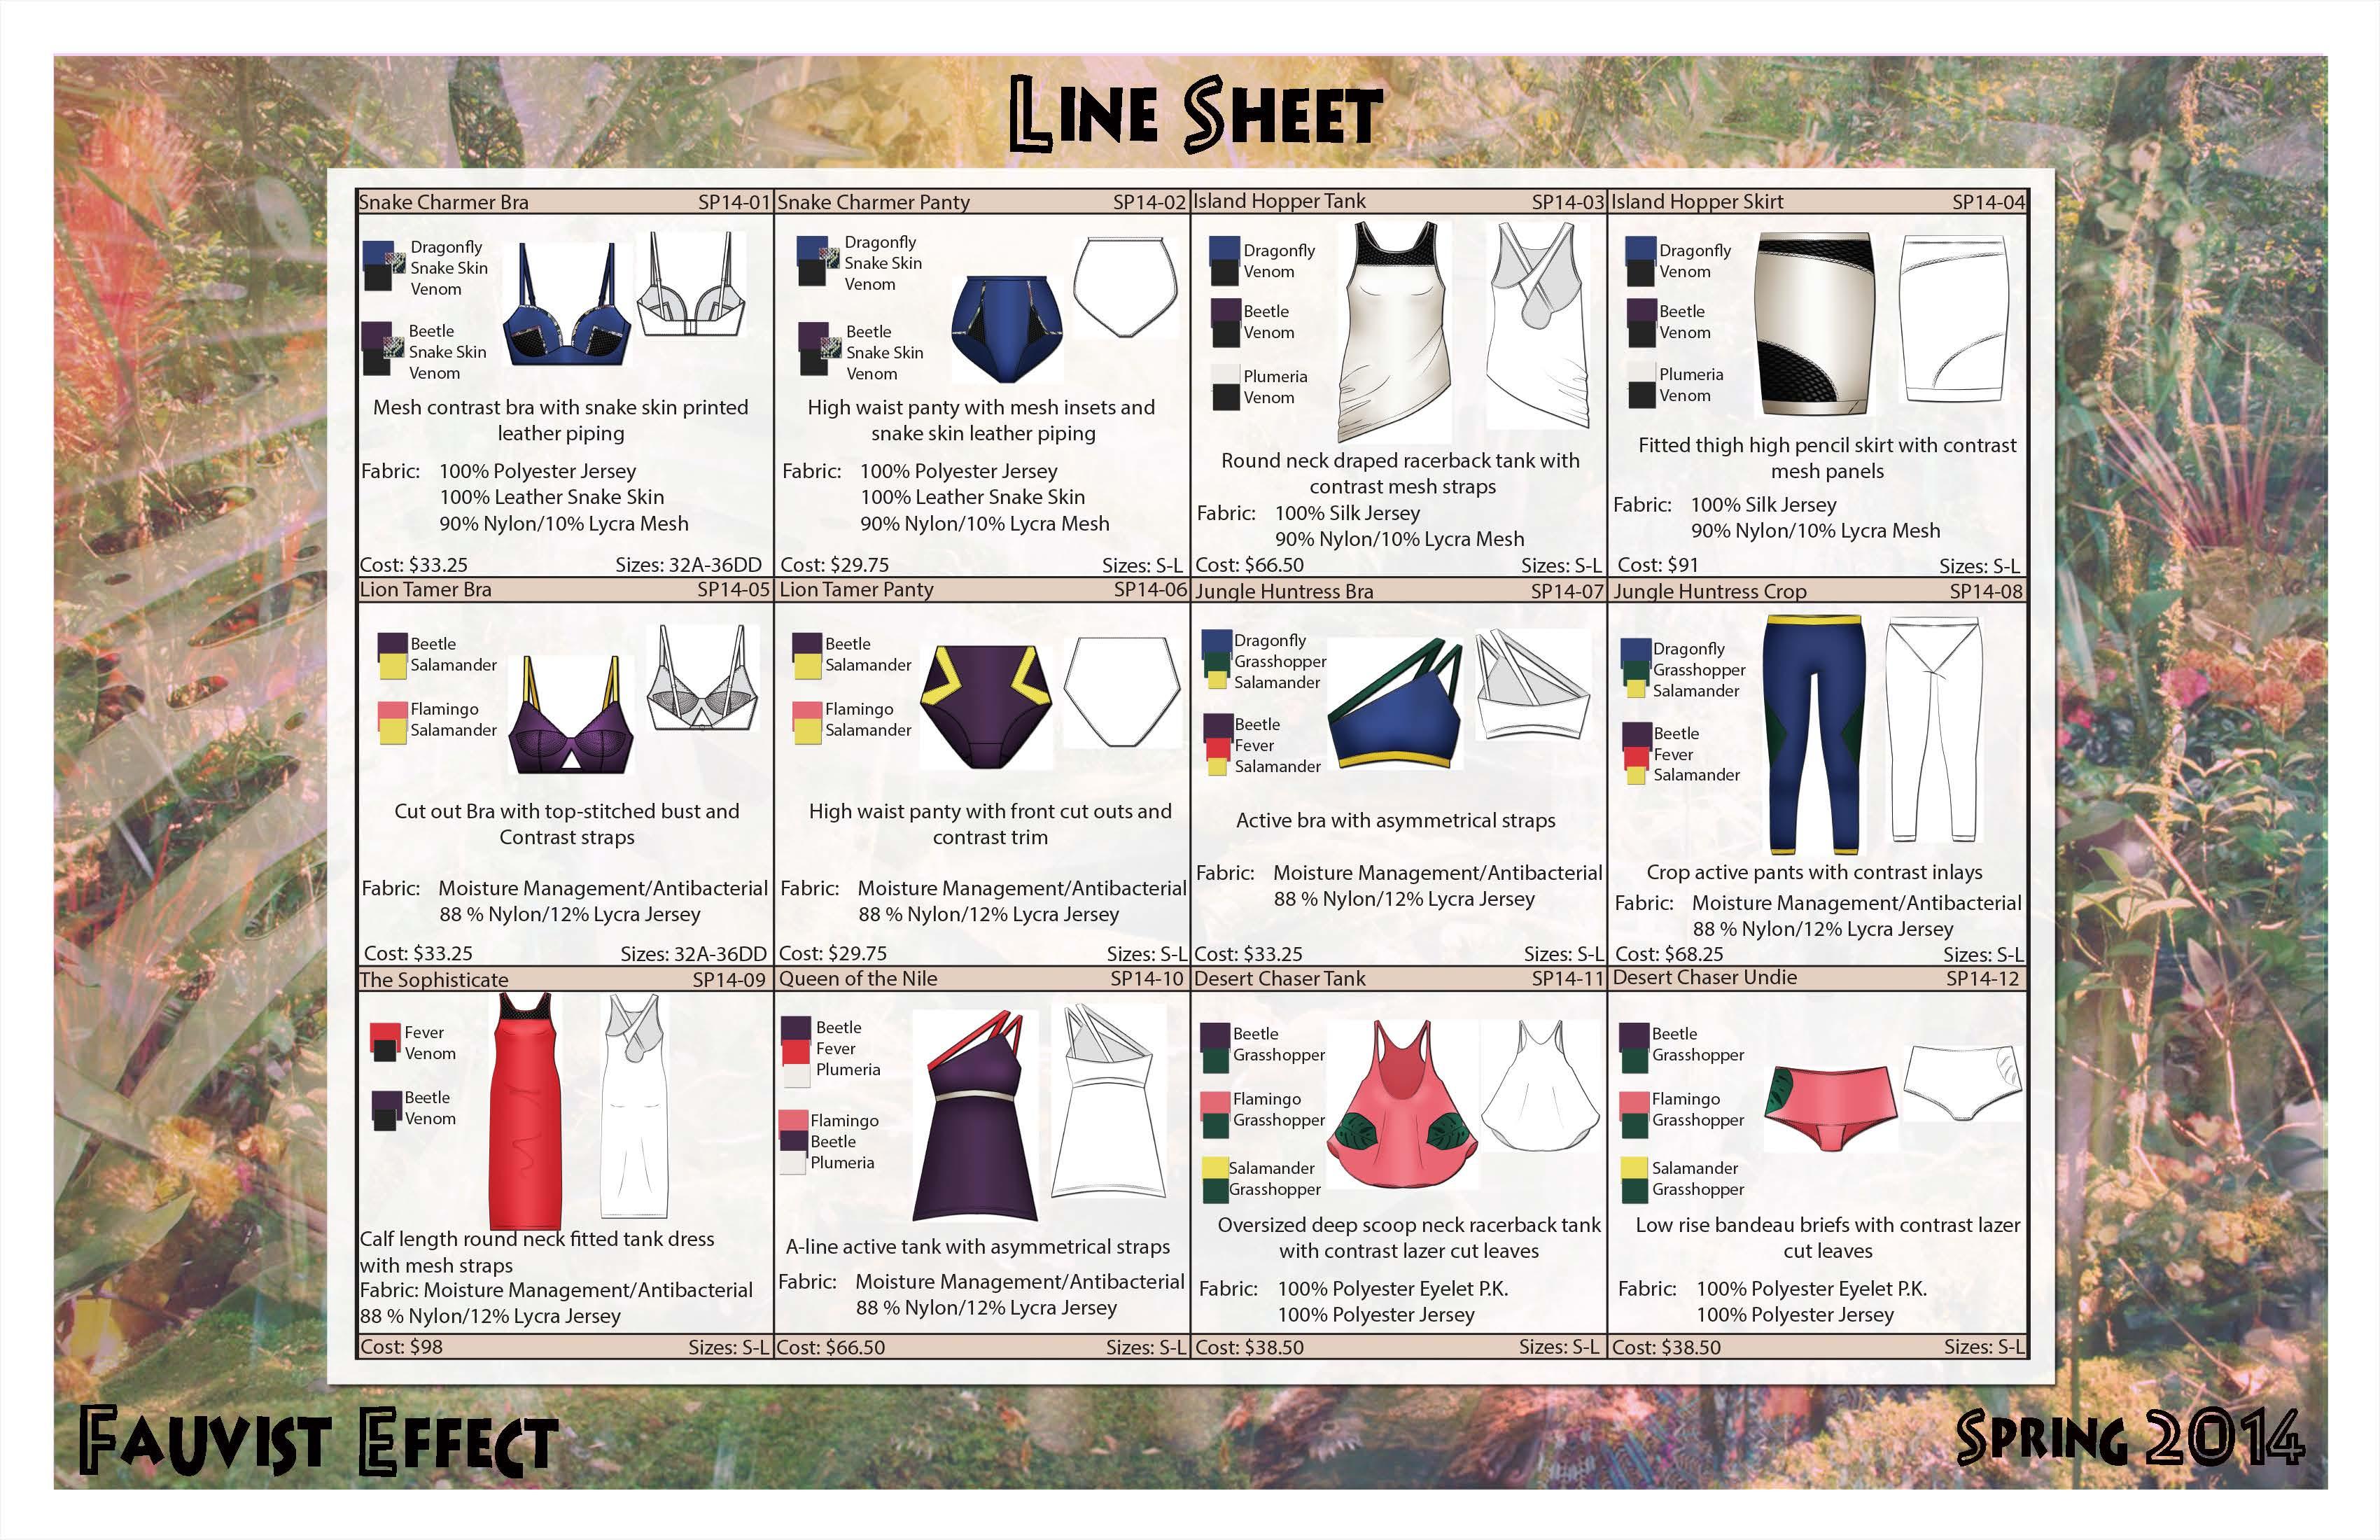 VPL Line Sheet | Dalliance Dilemma